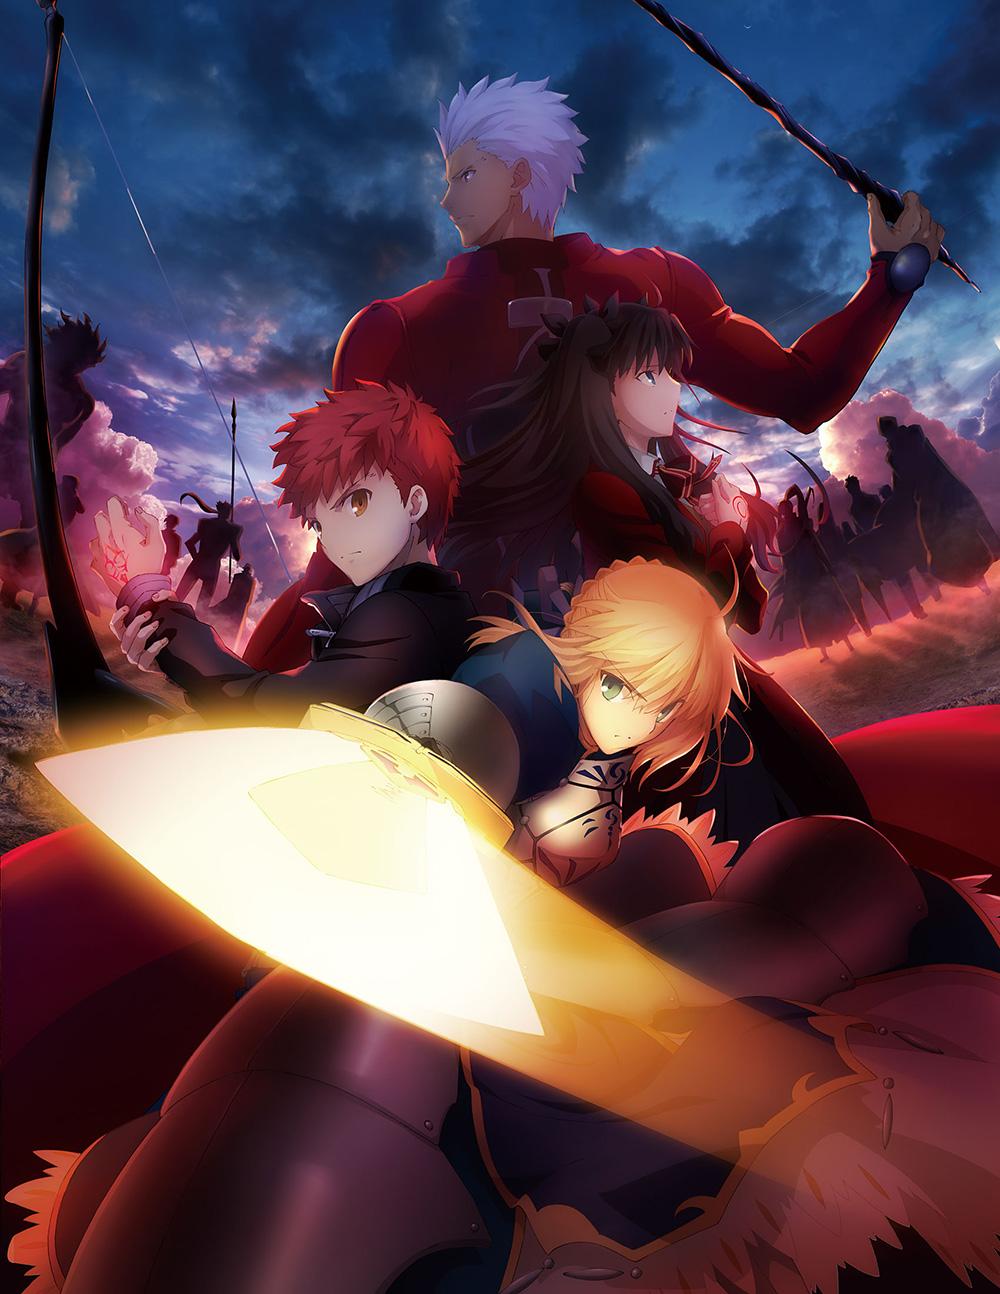 Fate-stay-night-Unlimited-Blade-Works_Haruhichan.com-Blu-ray Visual